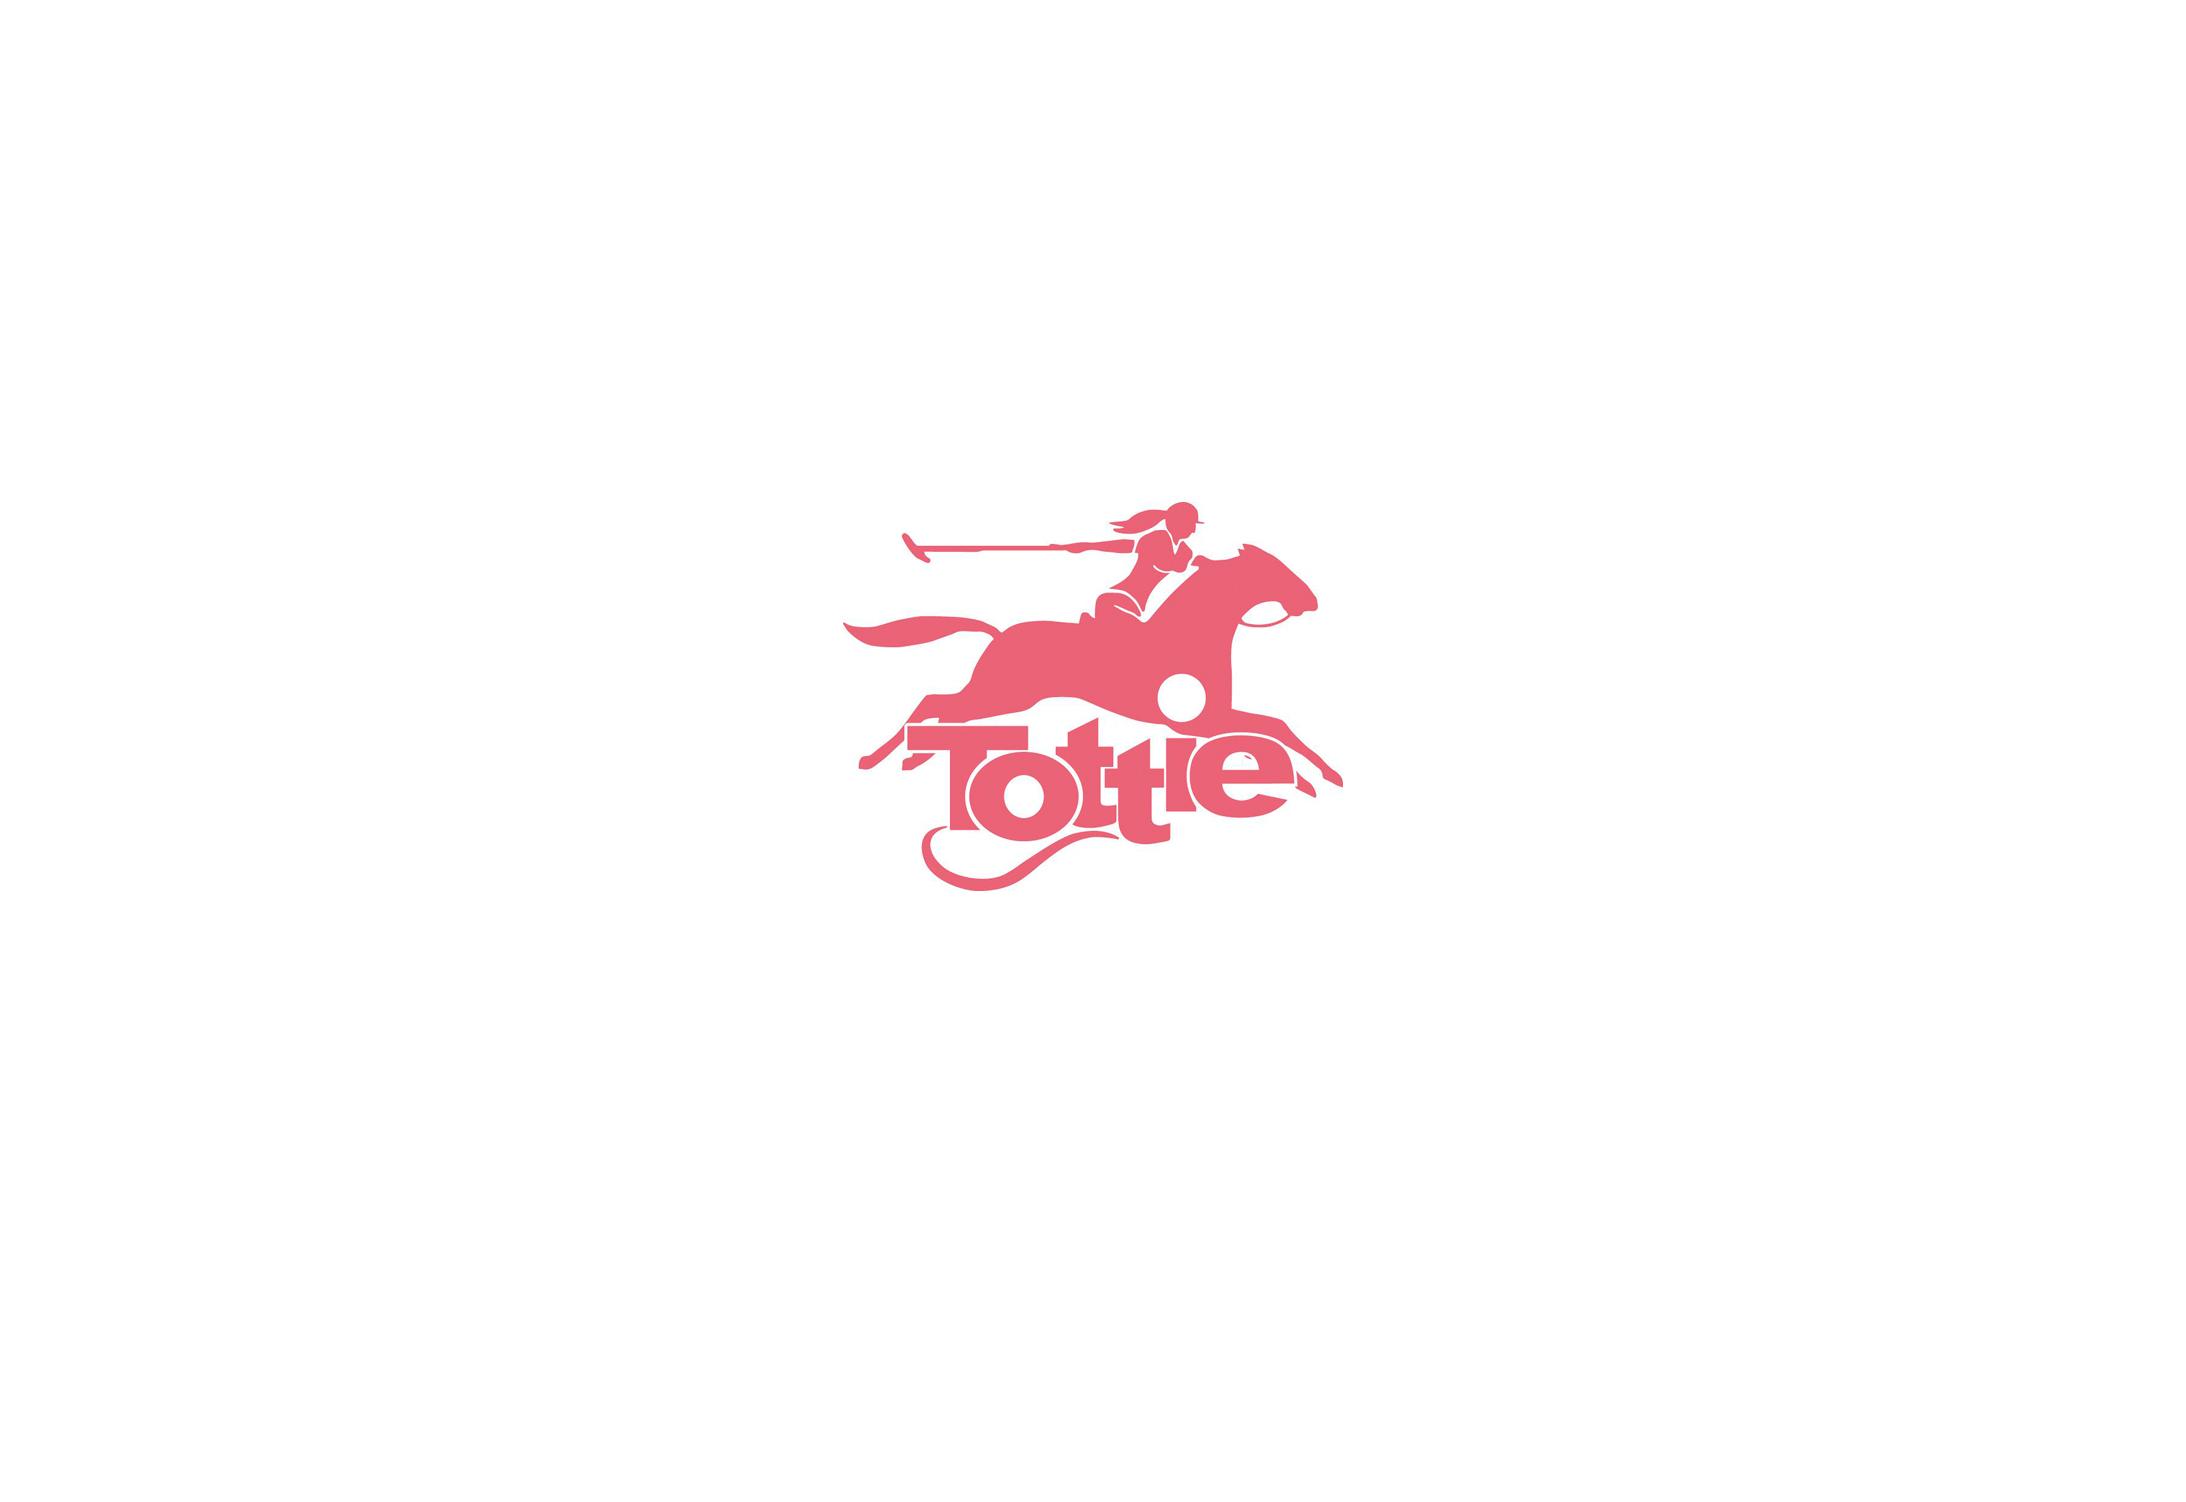 tottie_logo_small